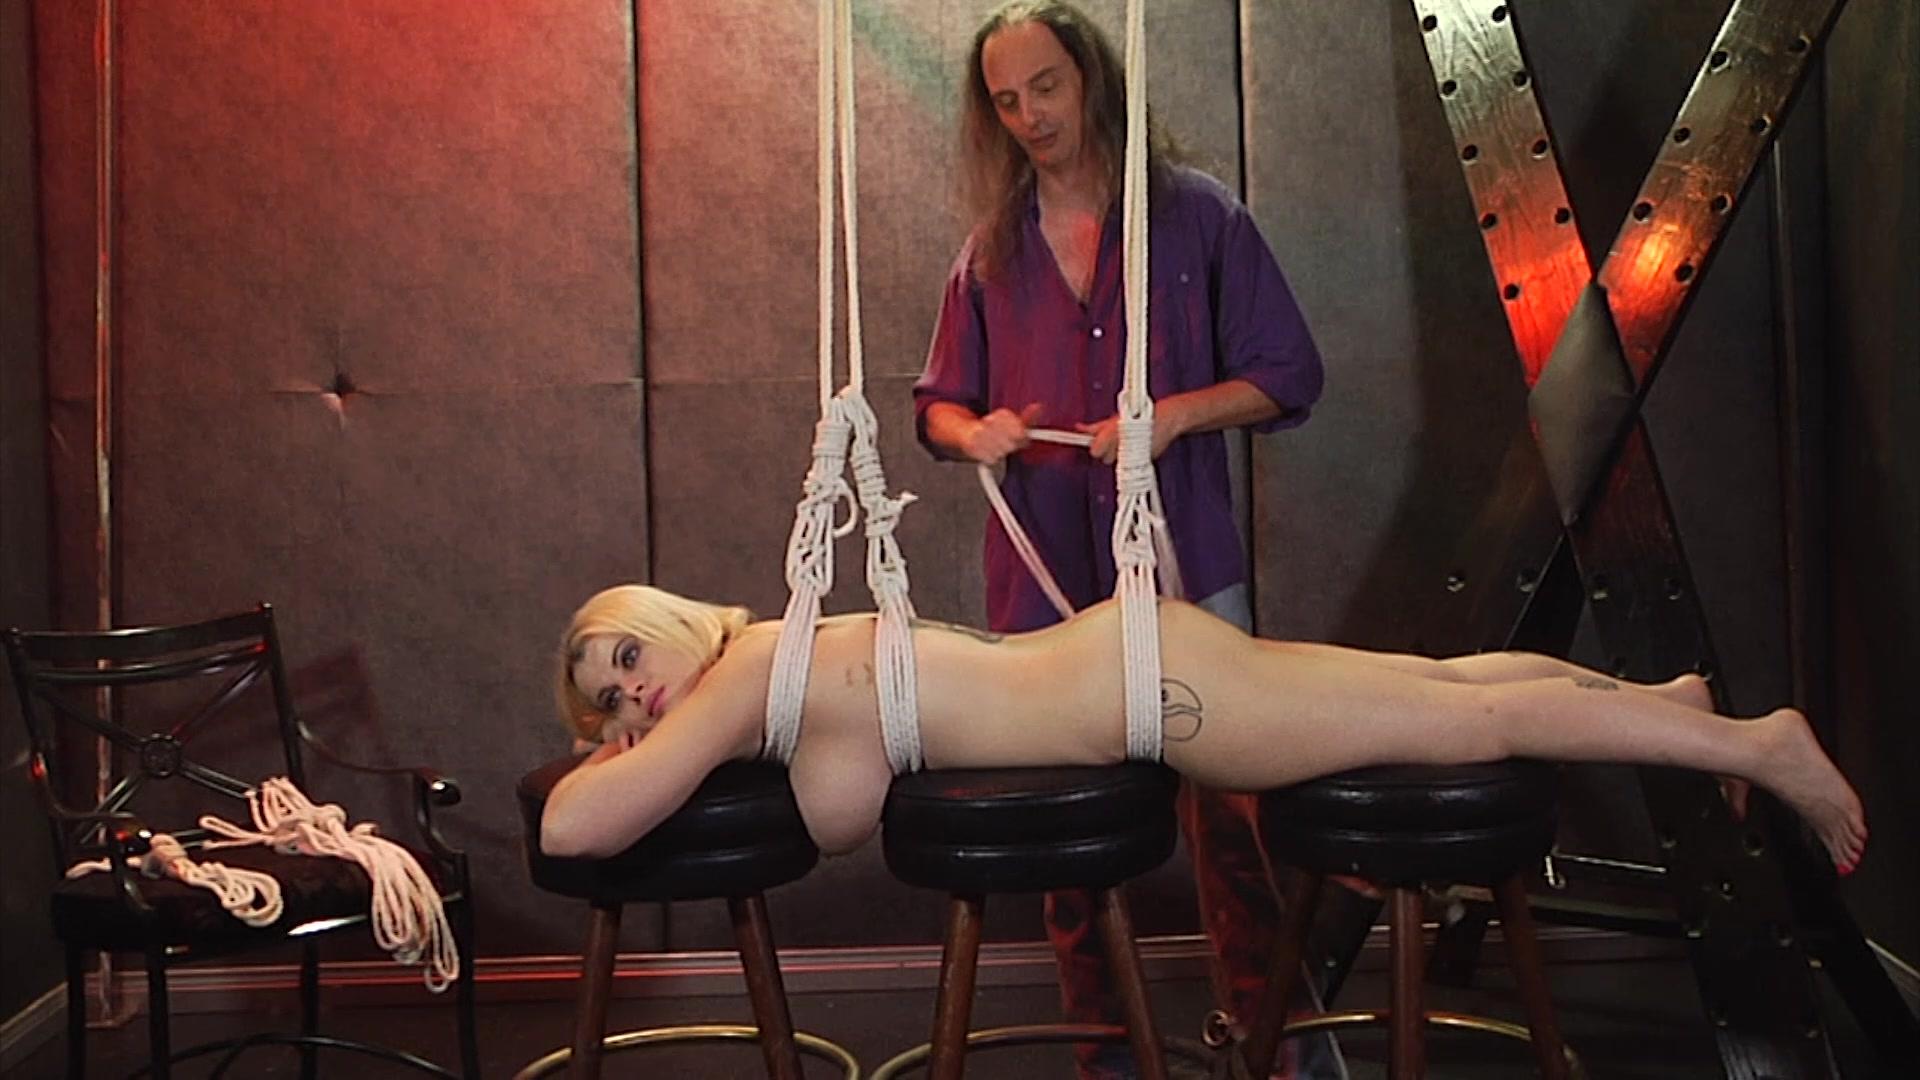 Free bdsm porn pics punishment bondage sex galery images